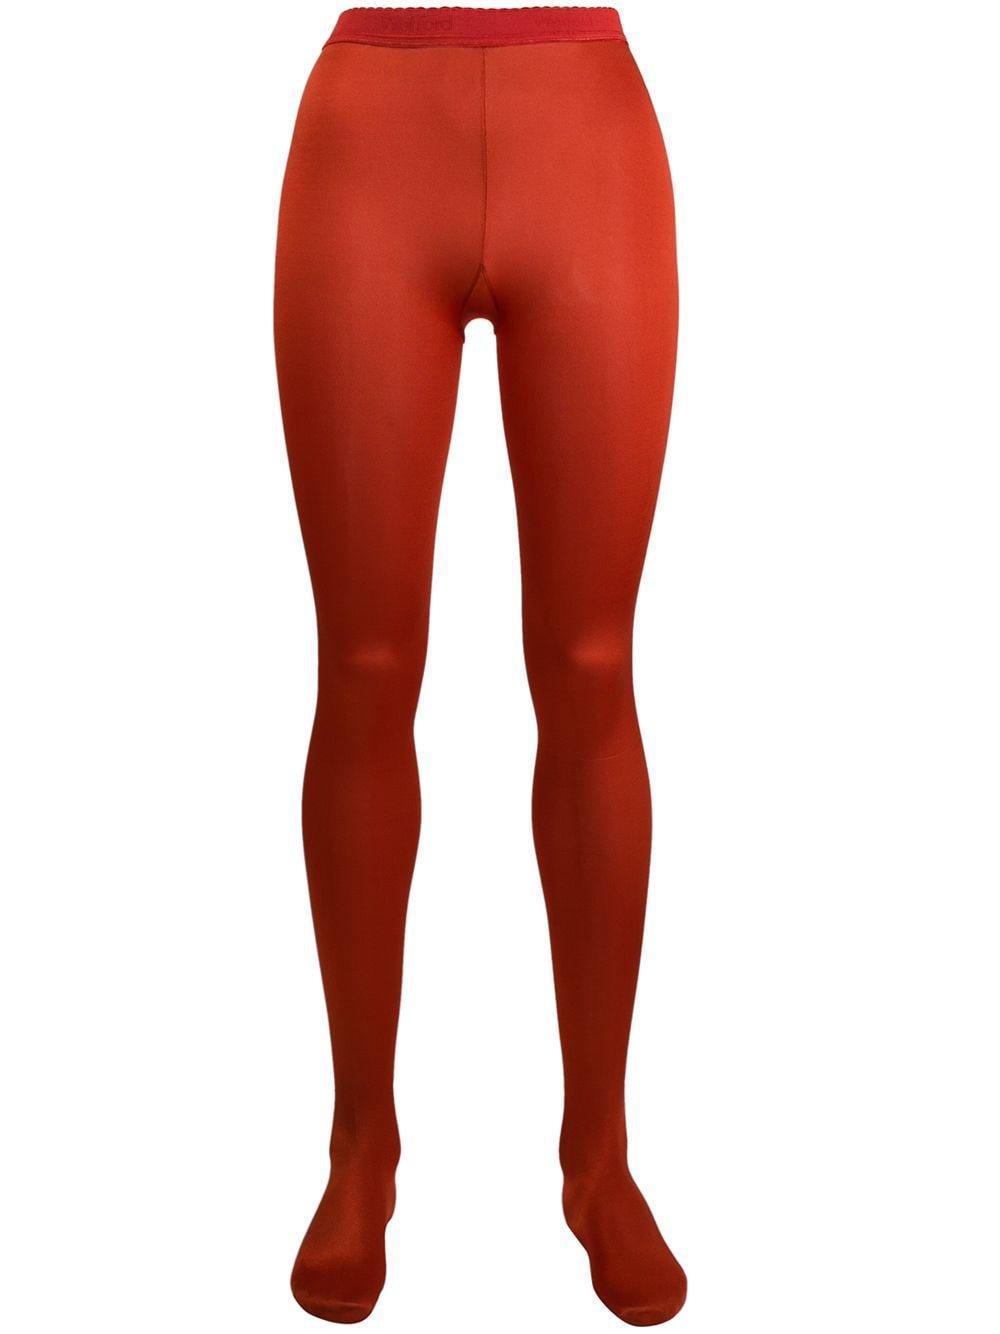 Wolford high-waist Tights